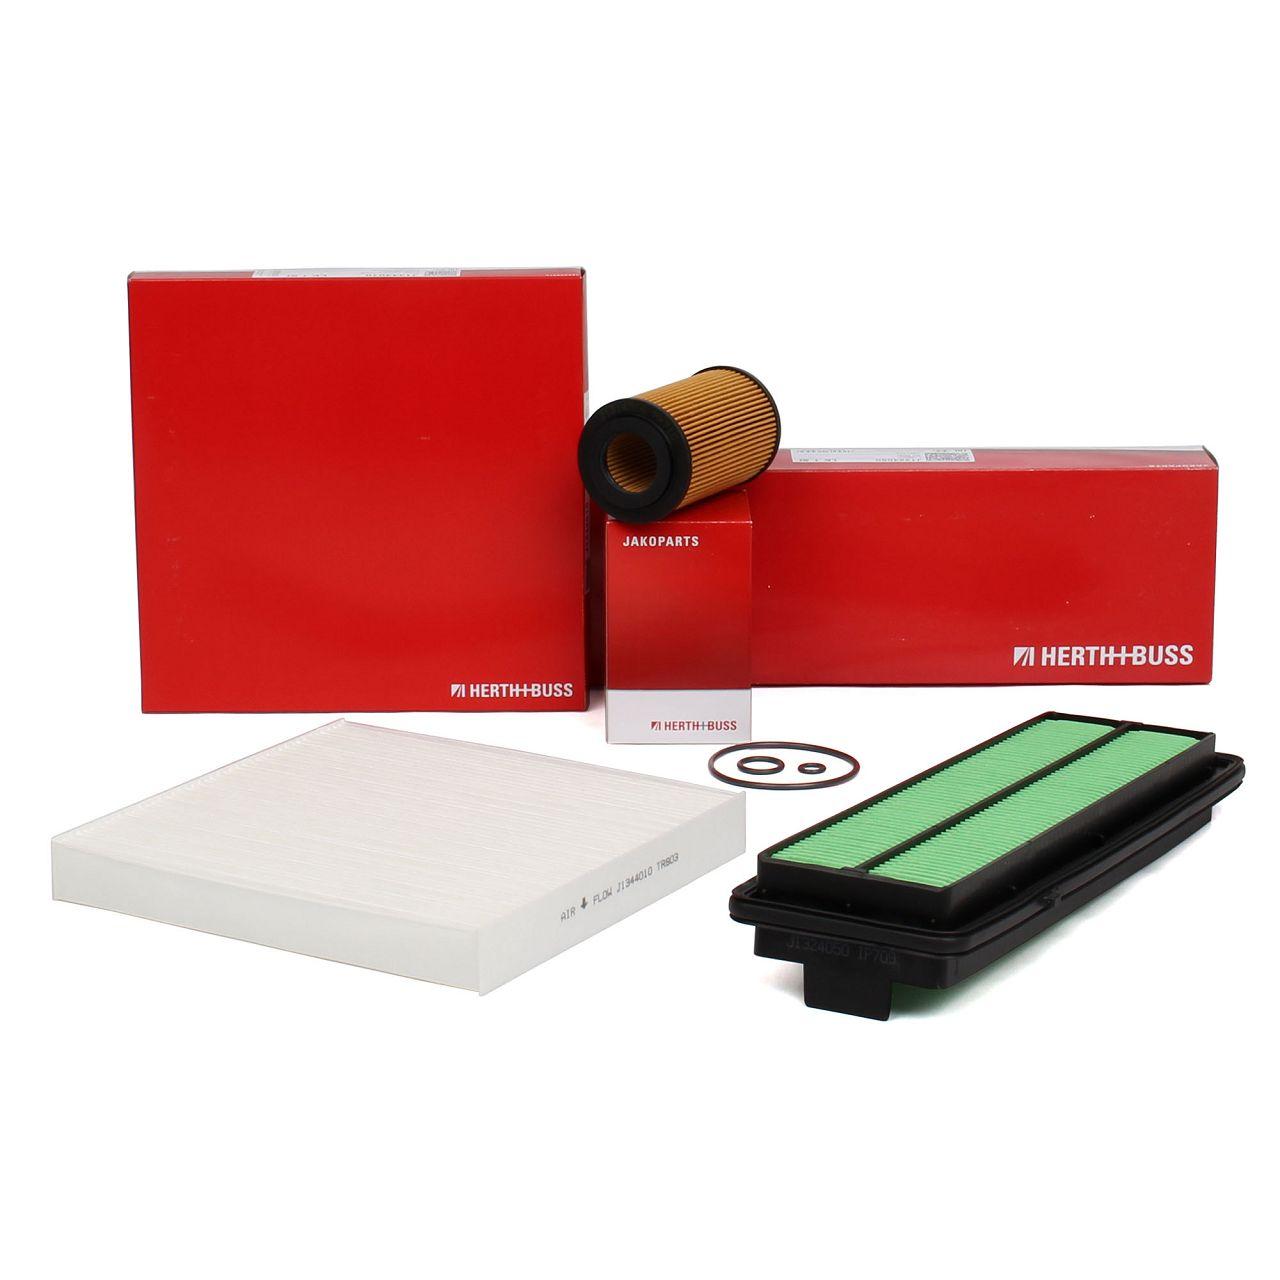 HERTH+BUSS JAKOPARTS Filterpaket Filterset für HONDA ACCORD VII (CL) 2.2 i-CTDi